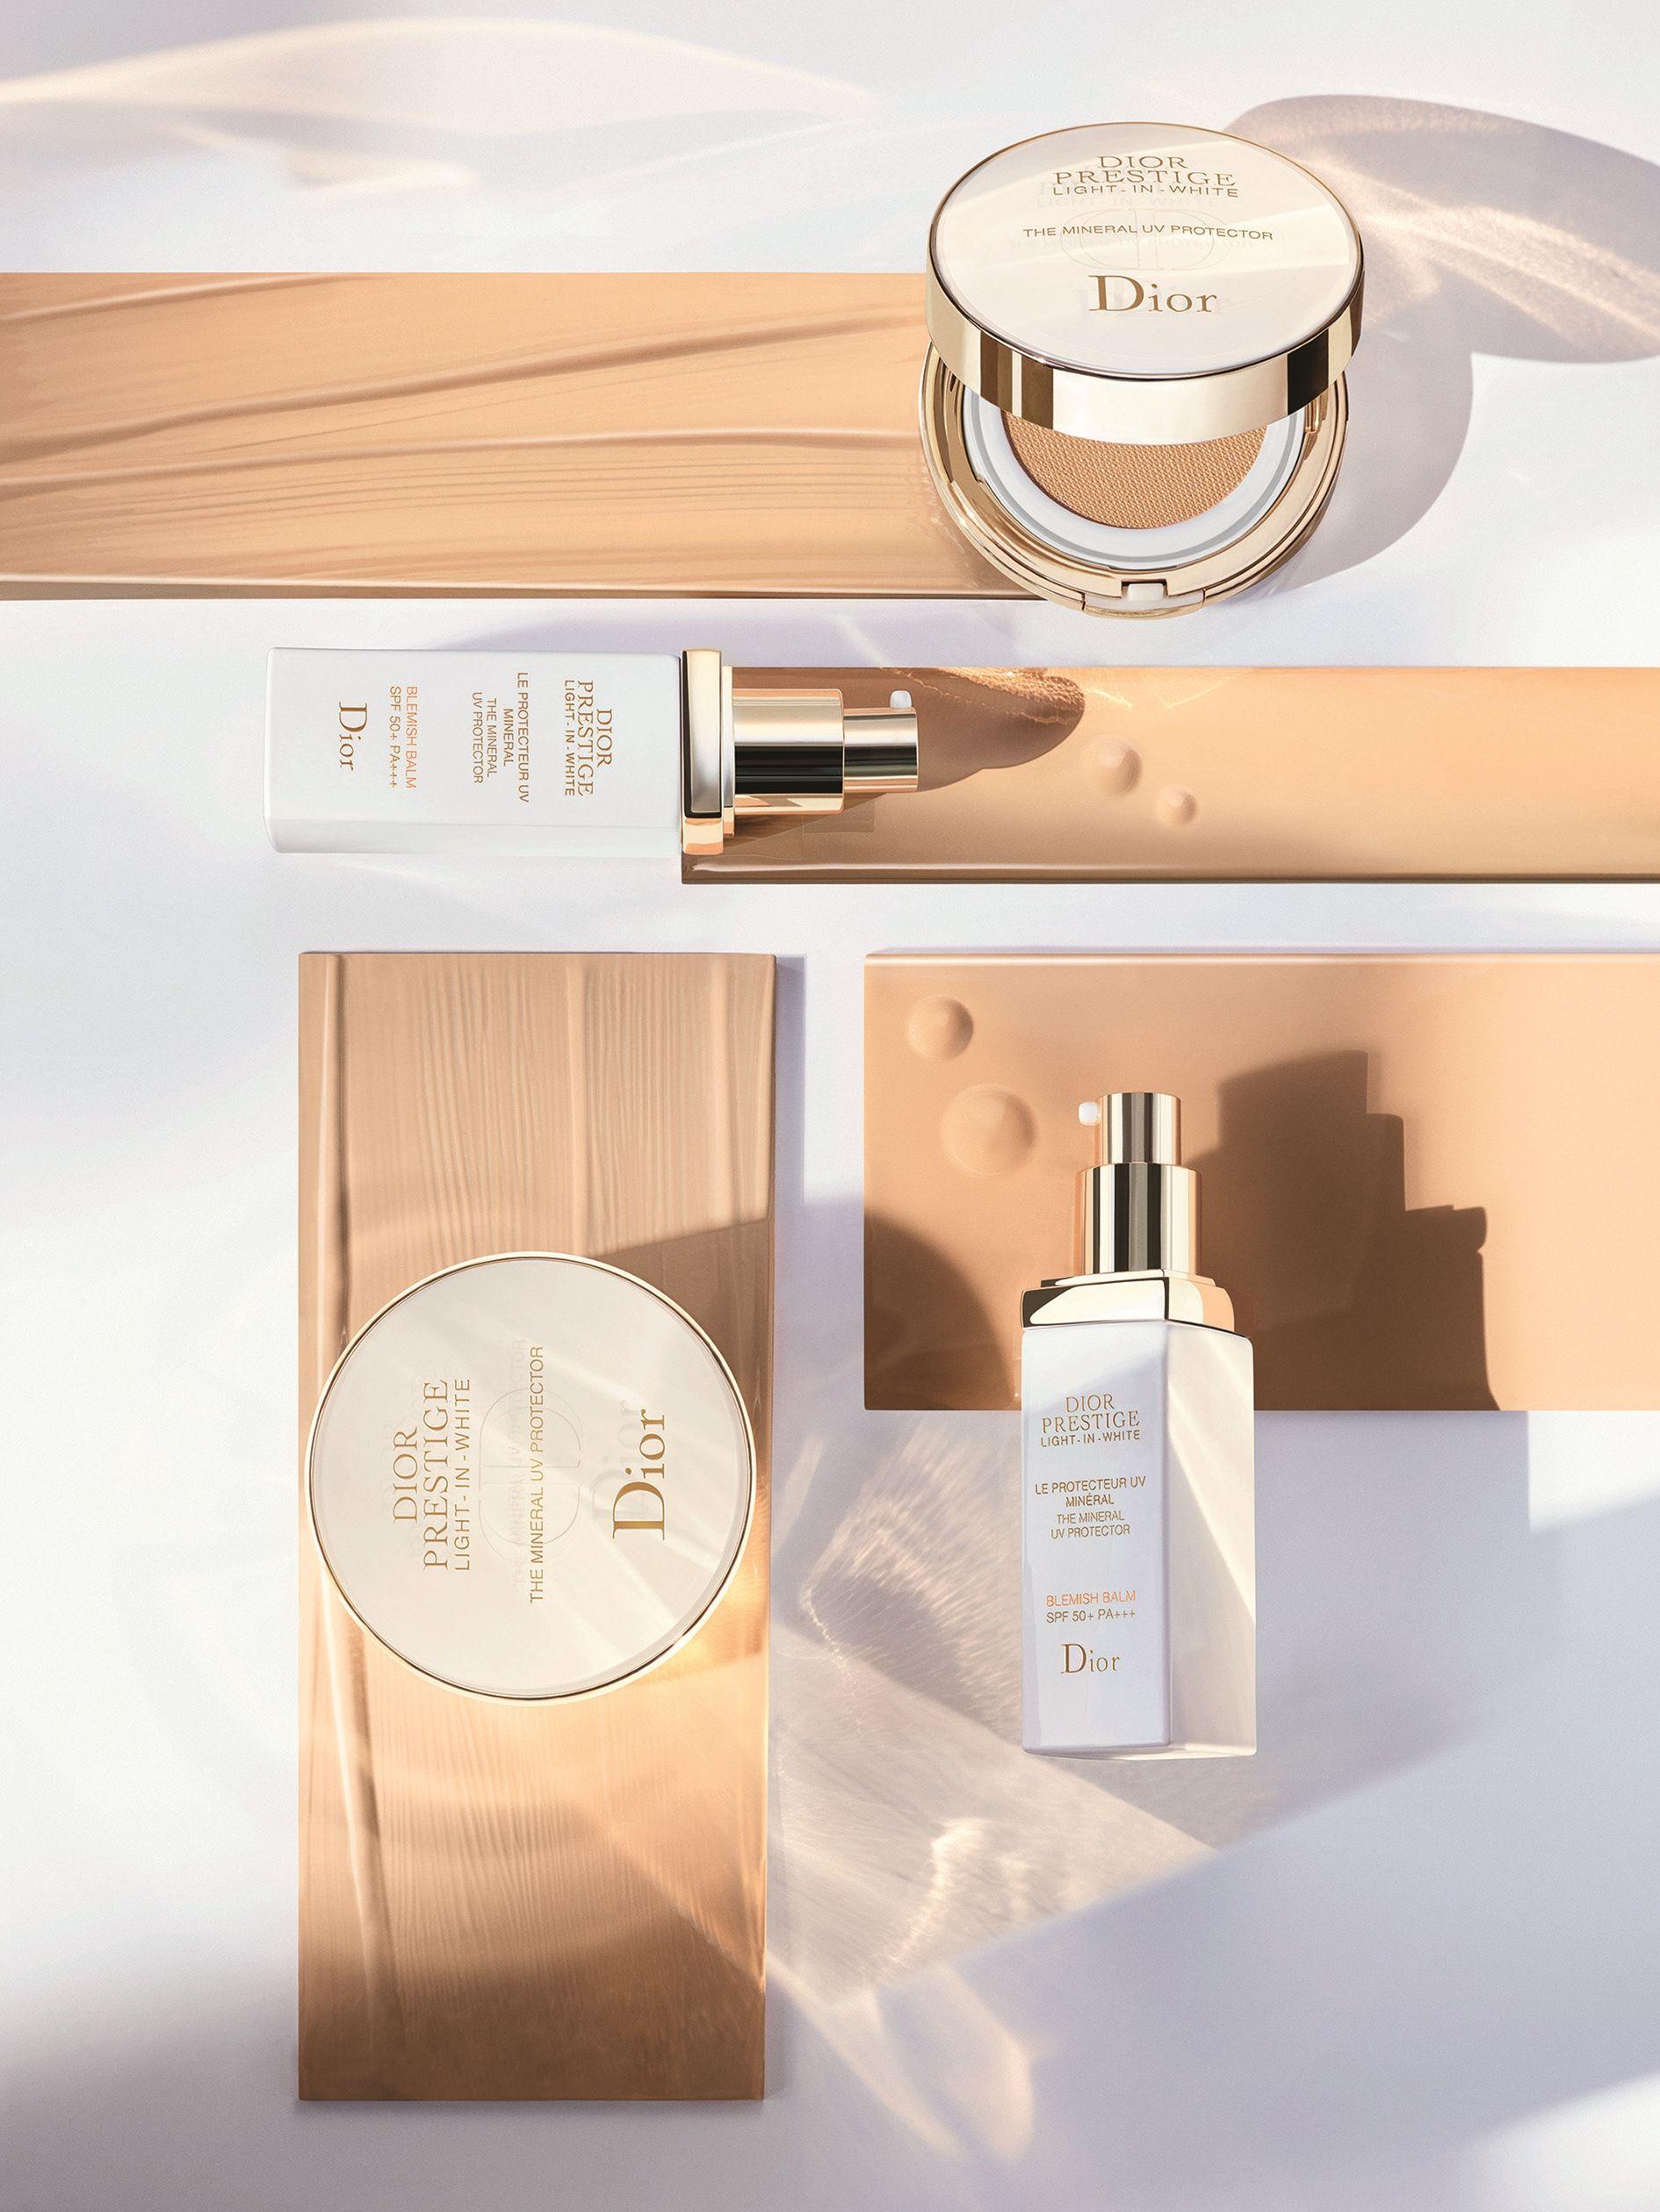 Dior,敏弱肌,美白精華,美白,推薦